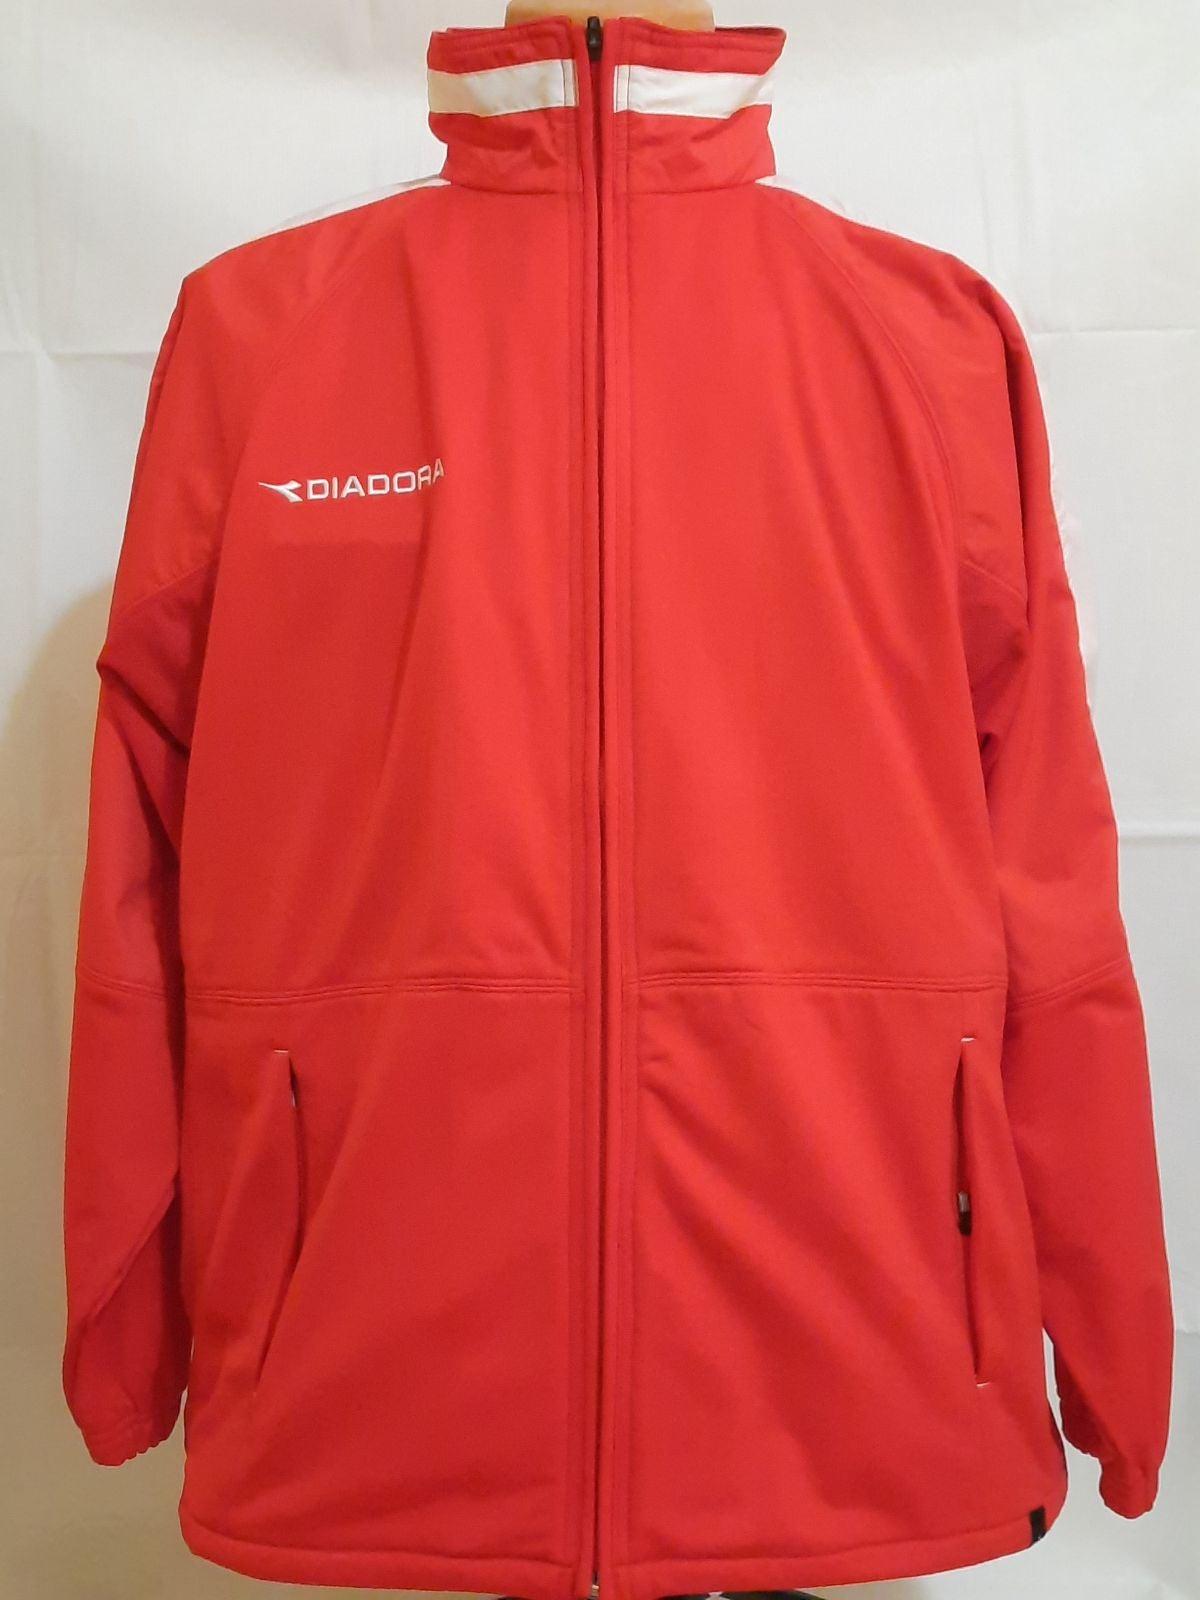 NWT DIADORA Attiva Jacket Size L